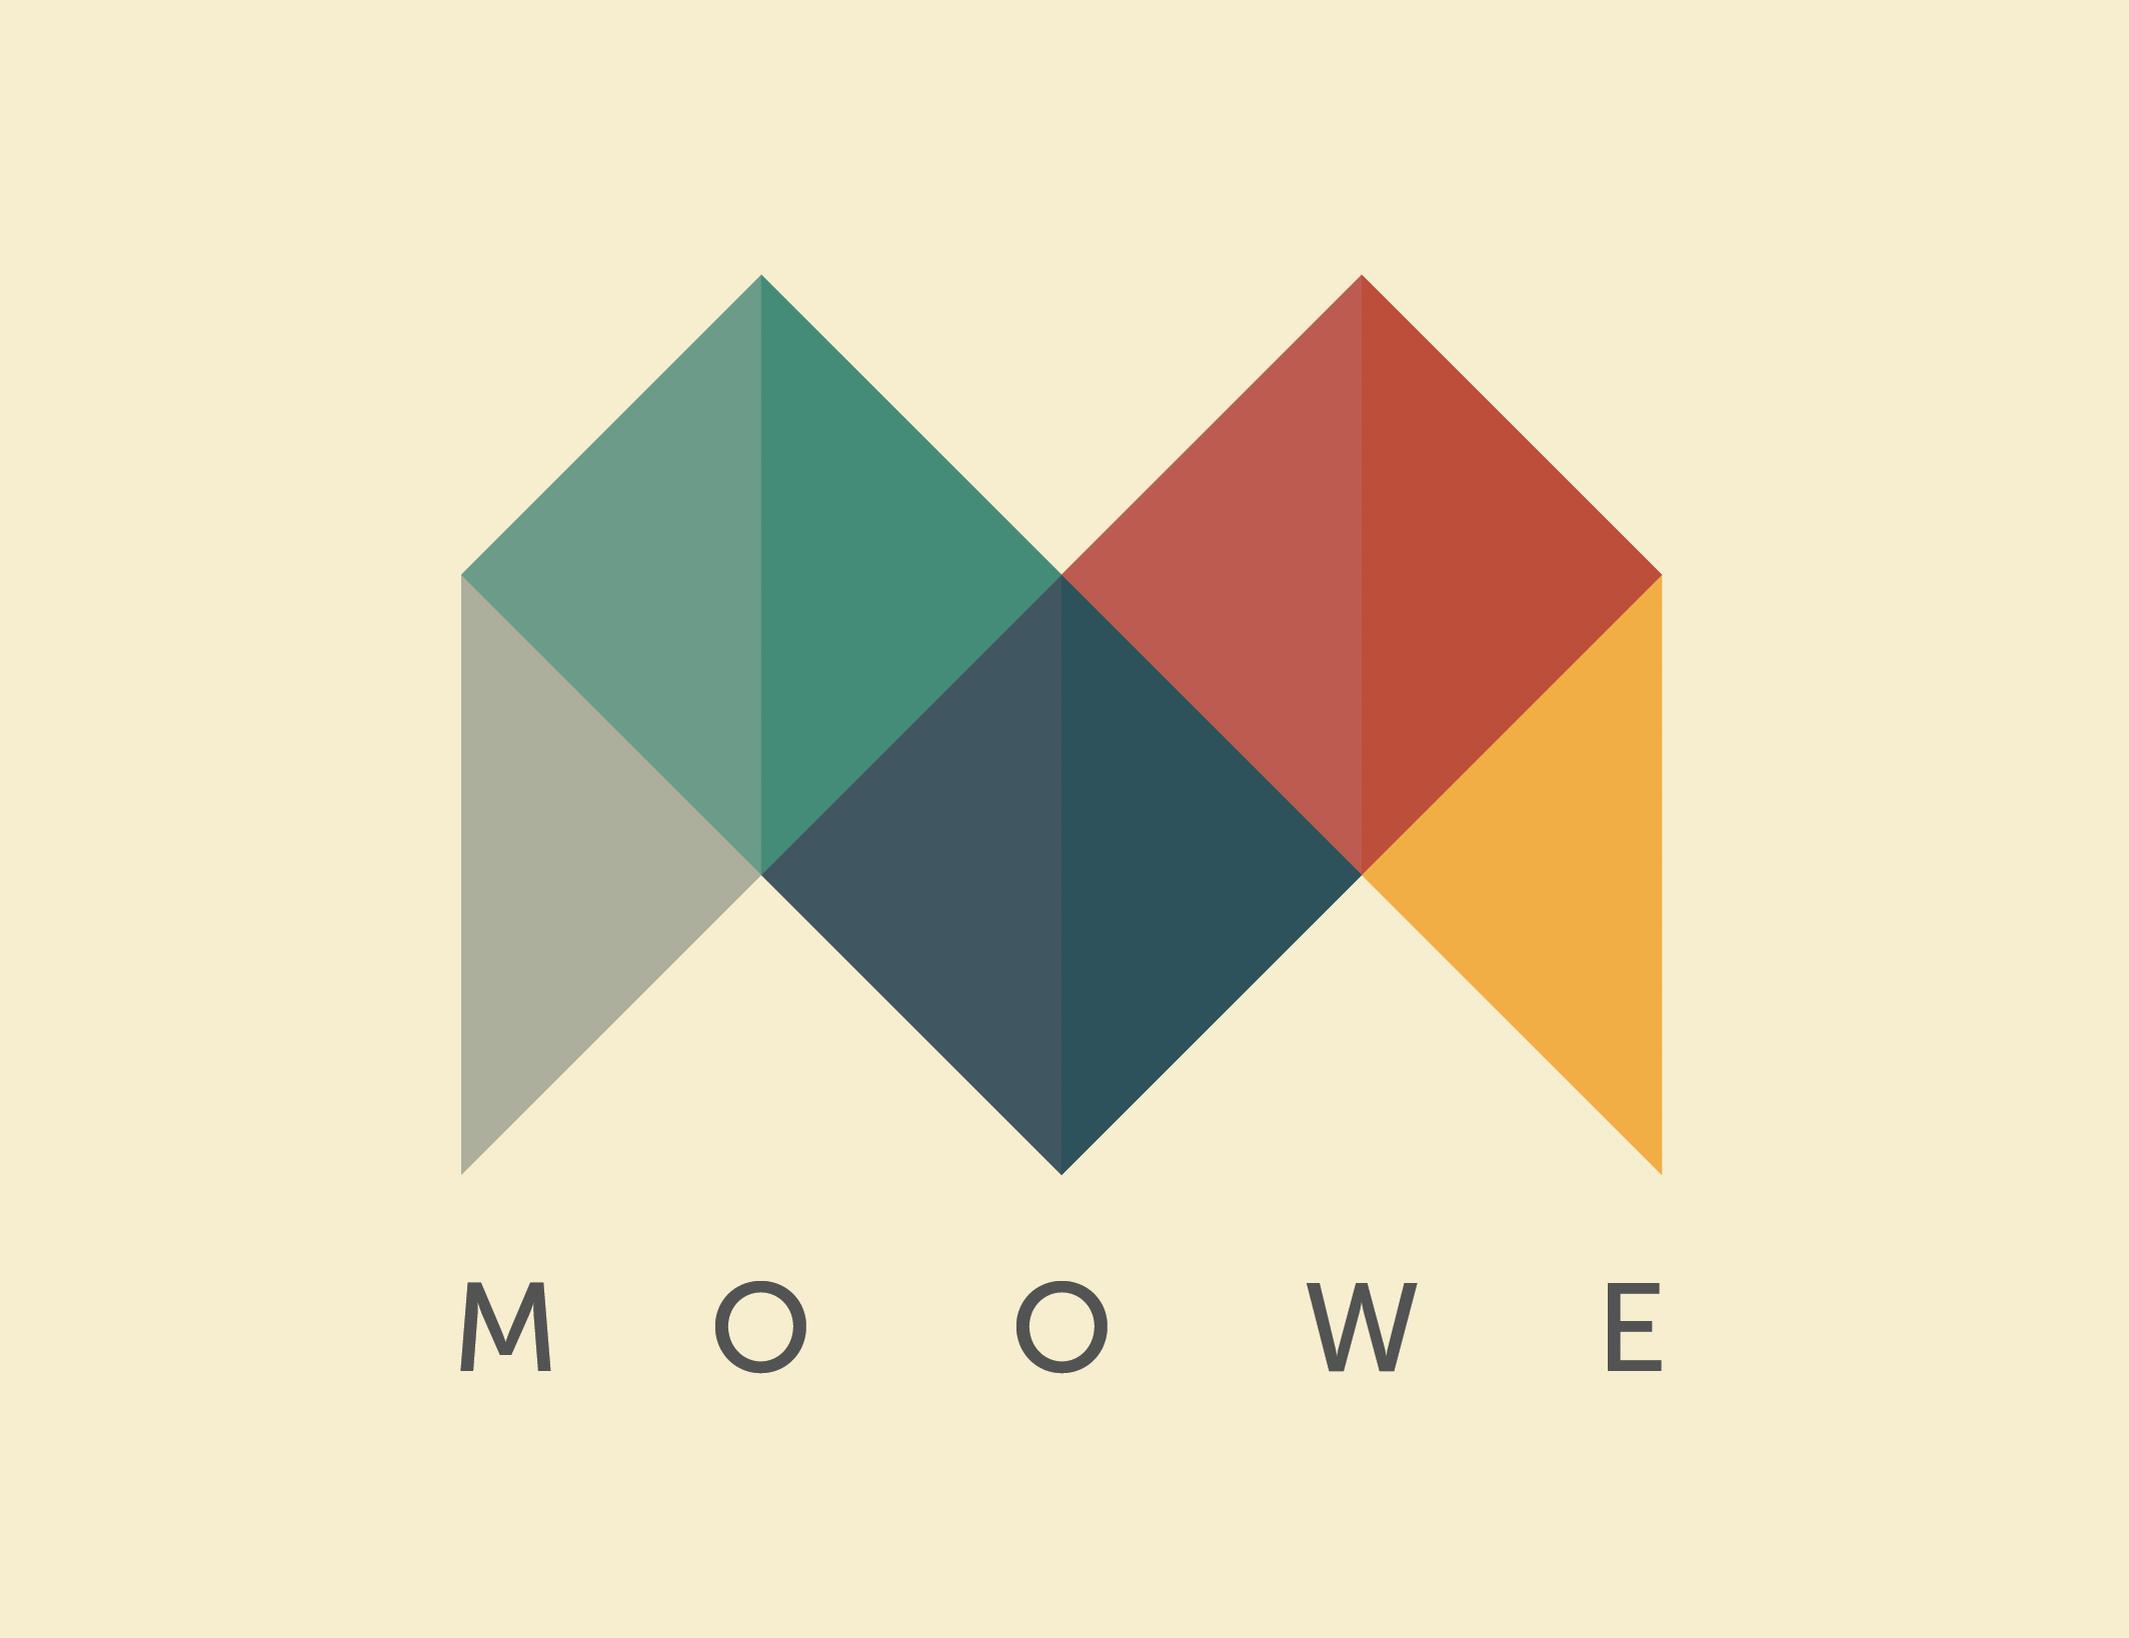 MOOWE-made